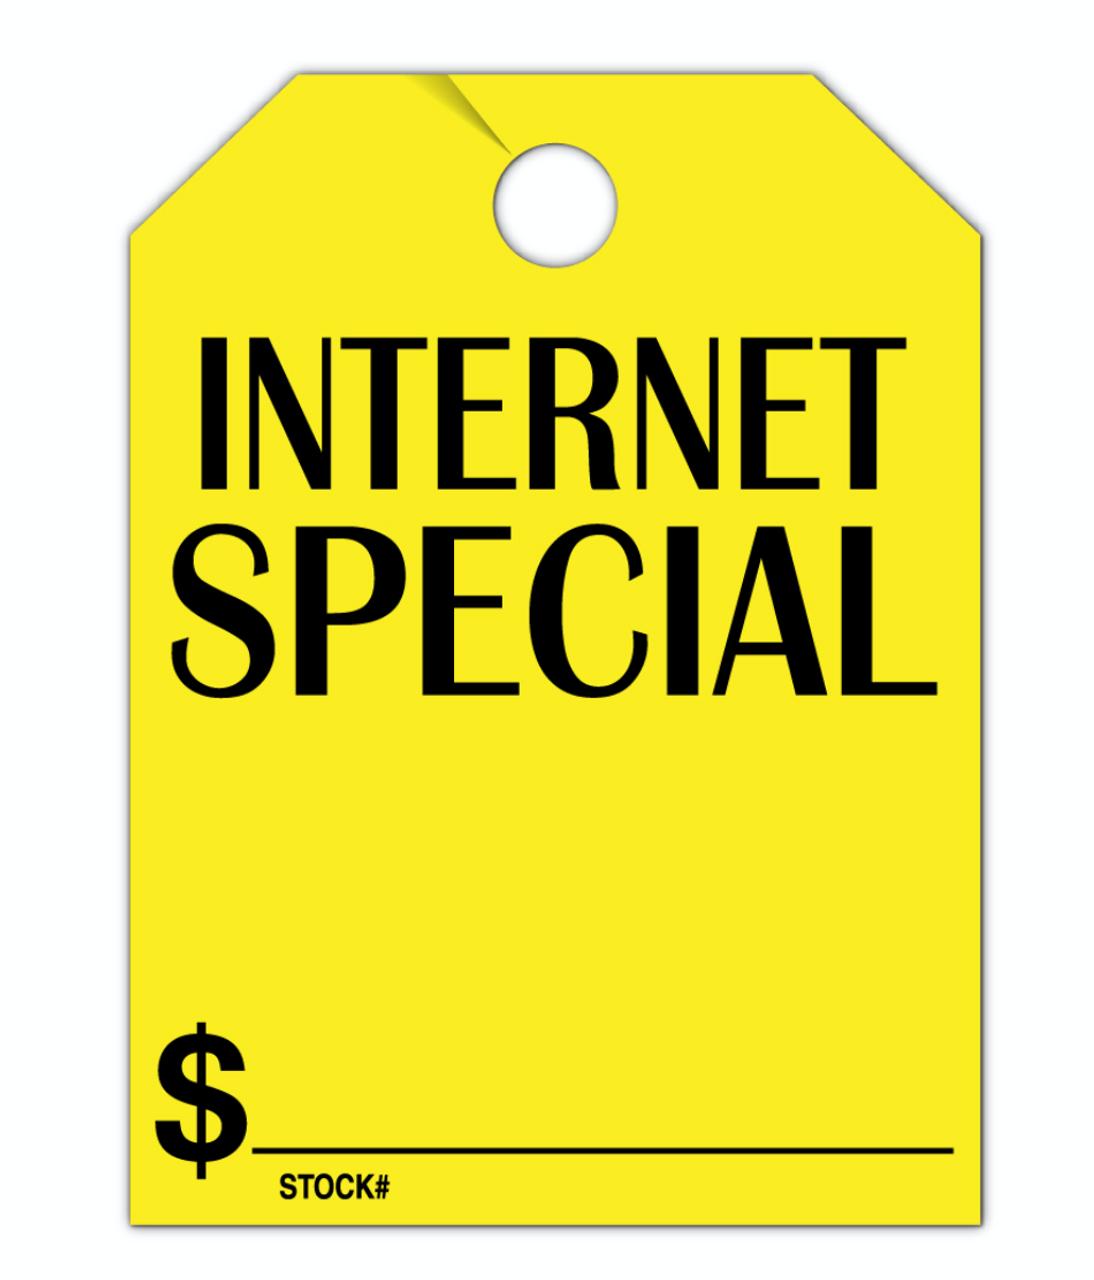 Internet Special Hang Tag 8.5 X 11.5